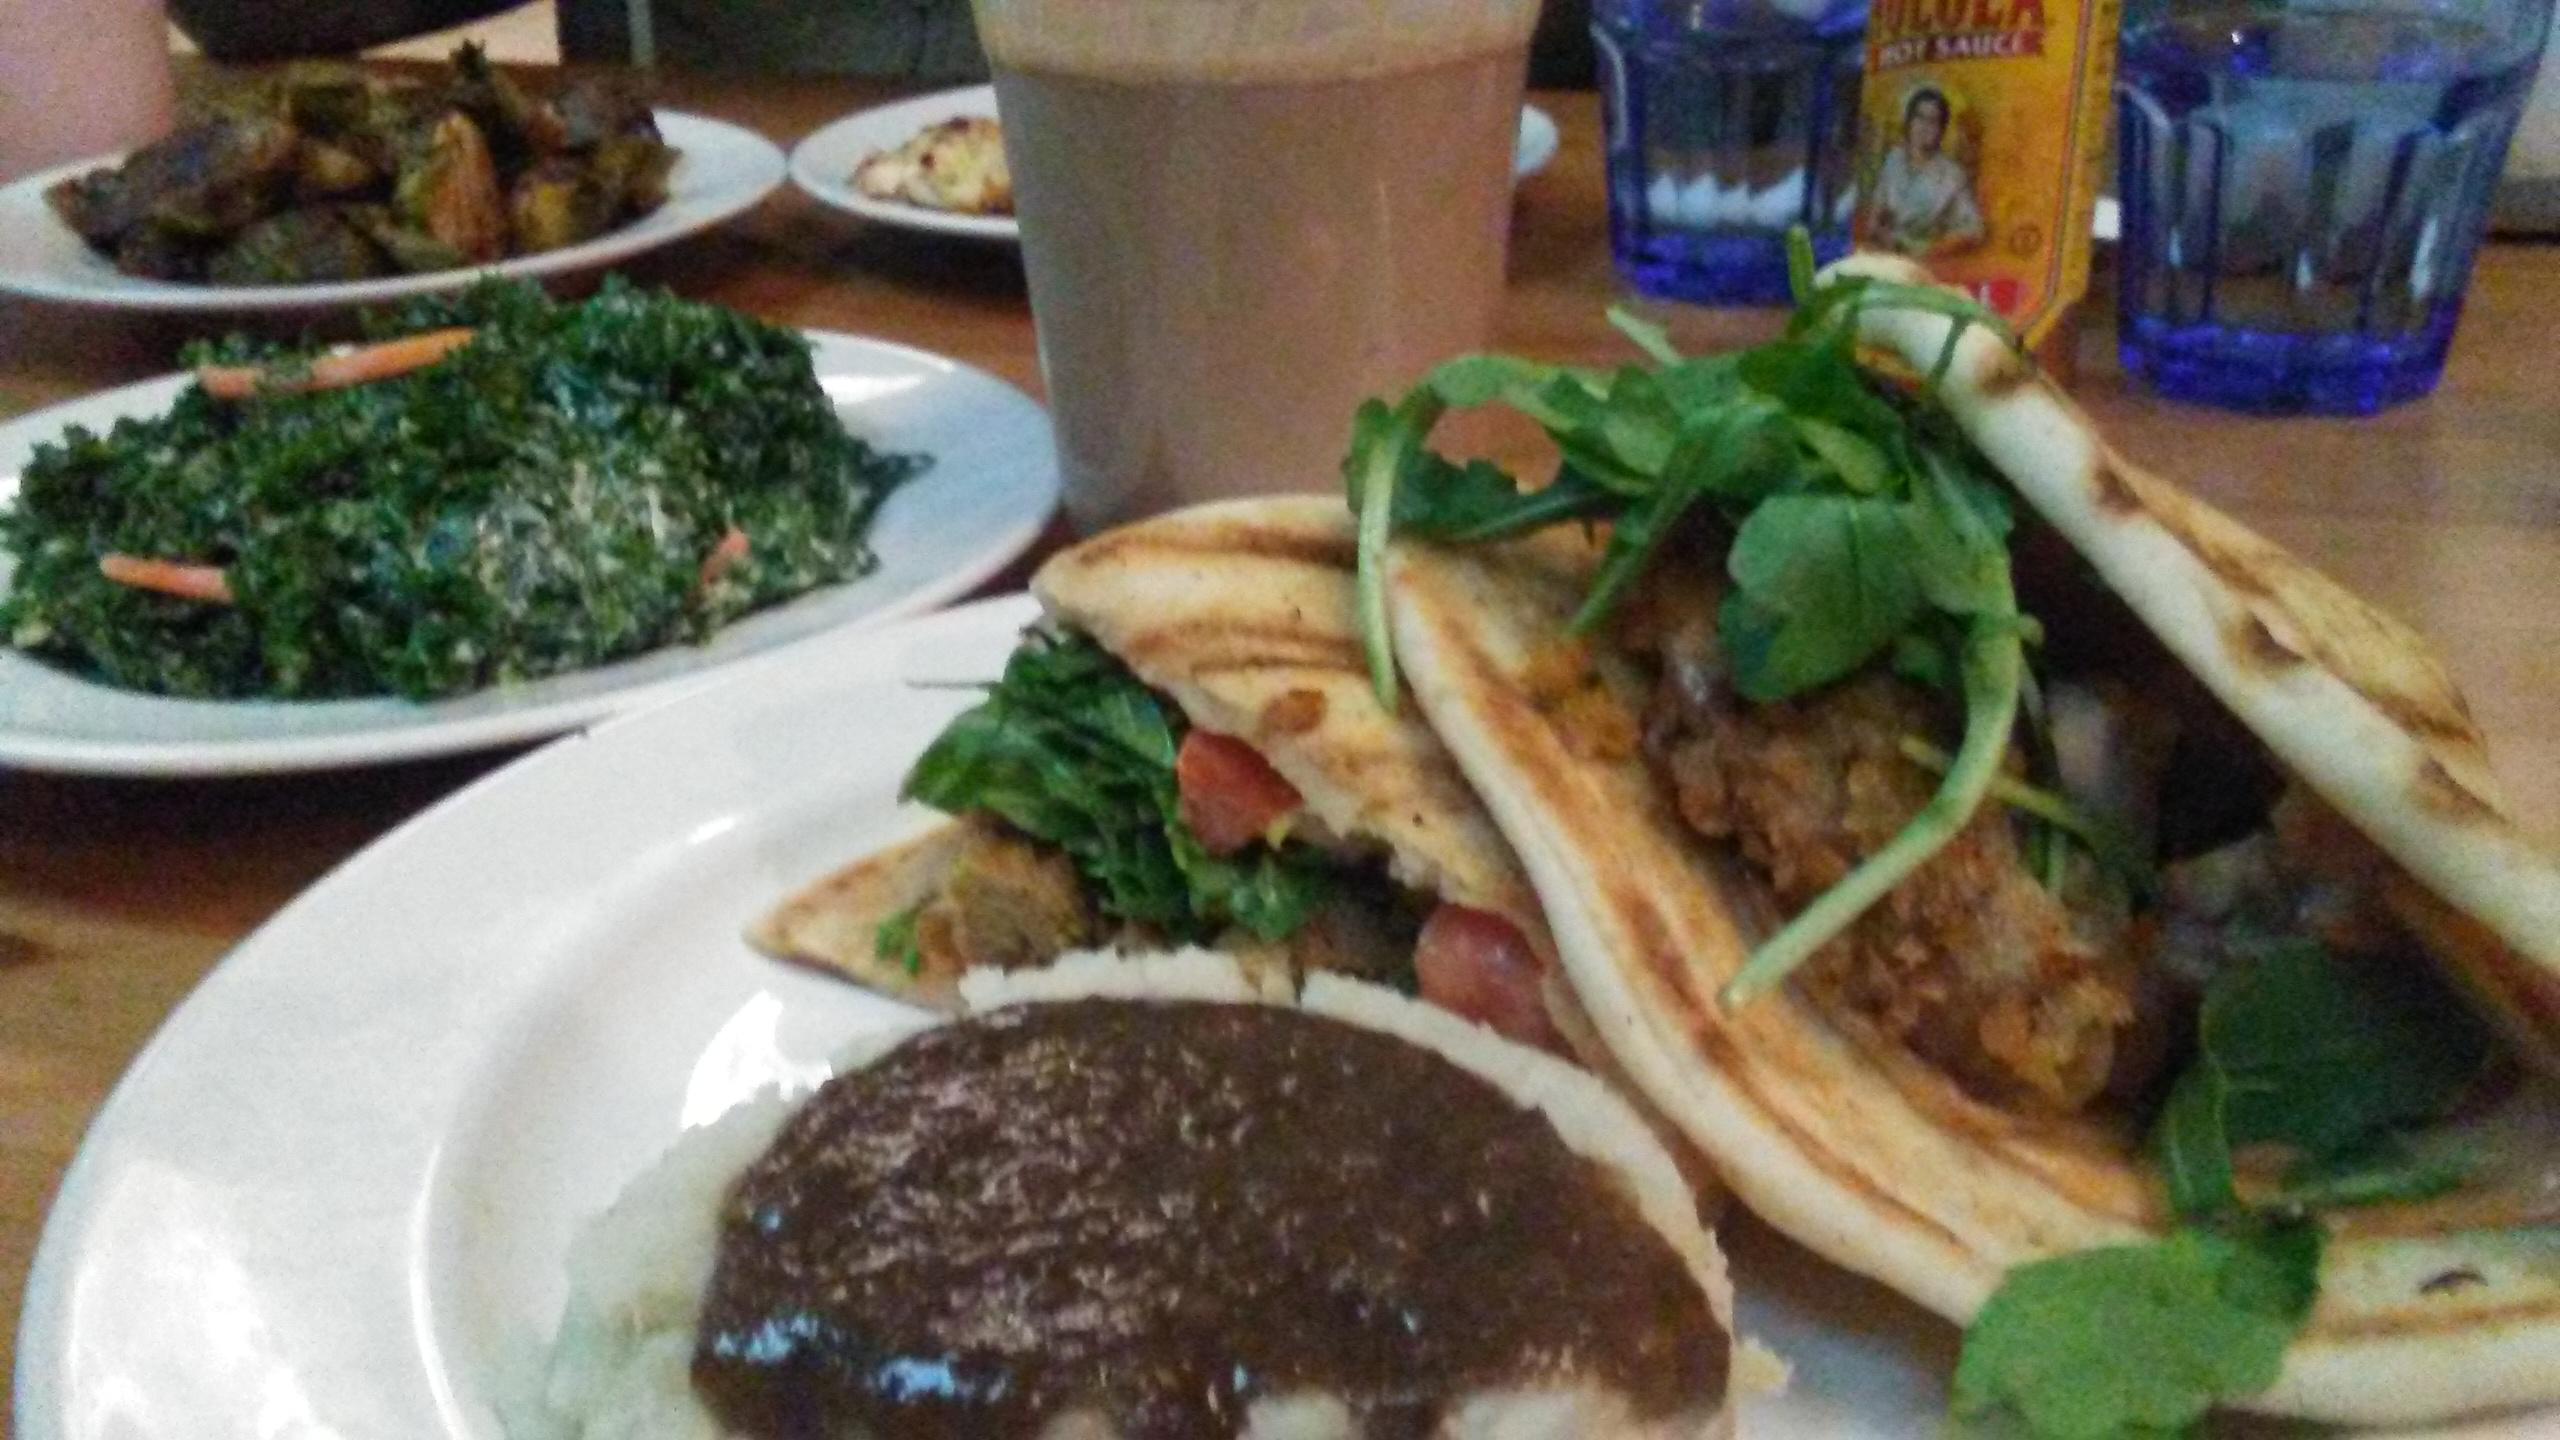 Vegan Restaurant In Union New Jersey The Vrg Blog